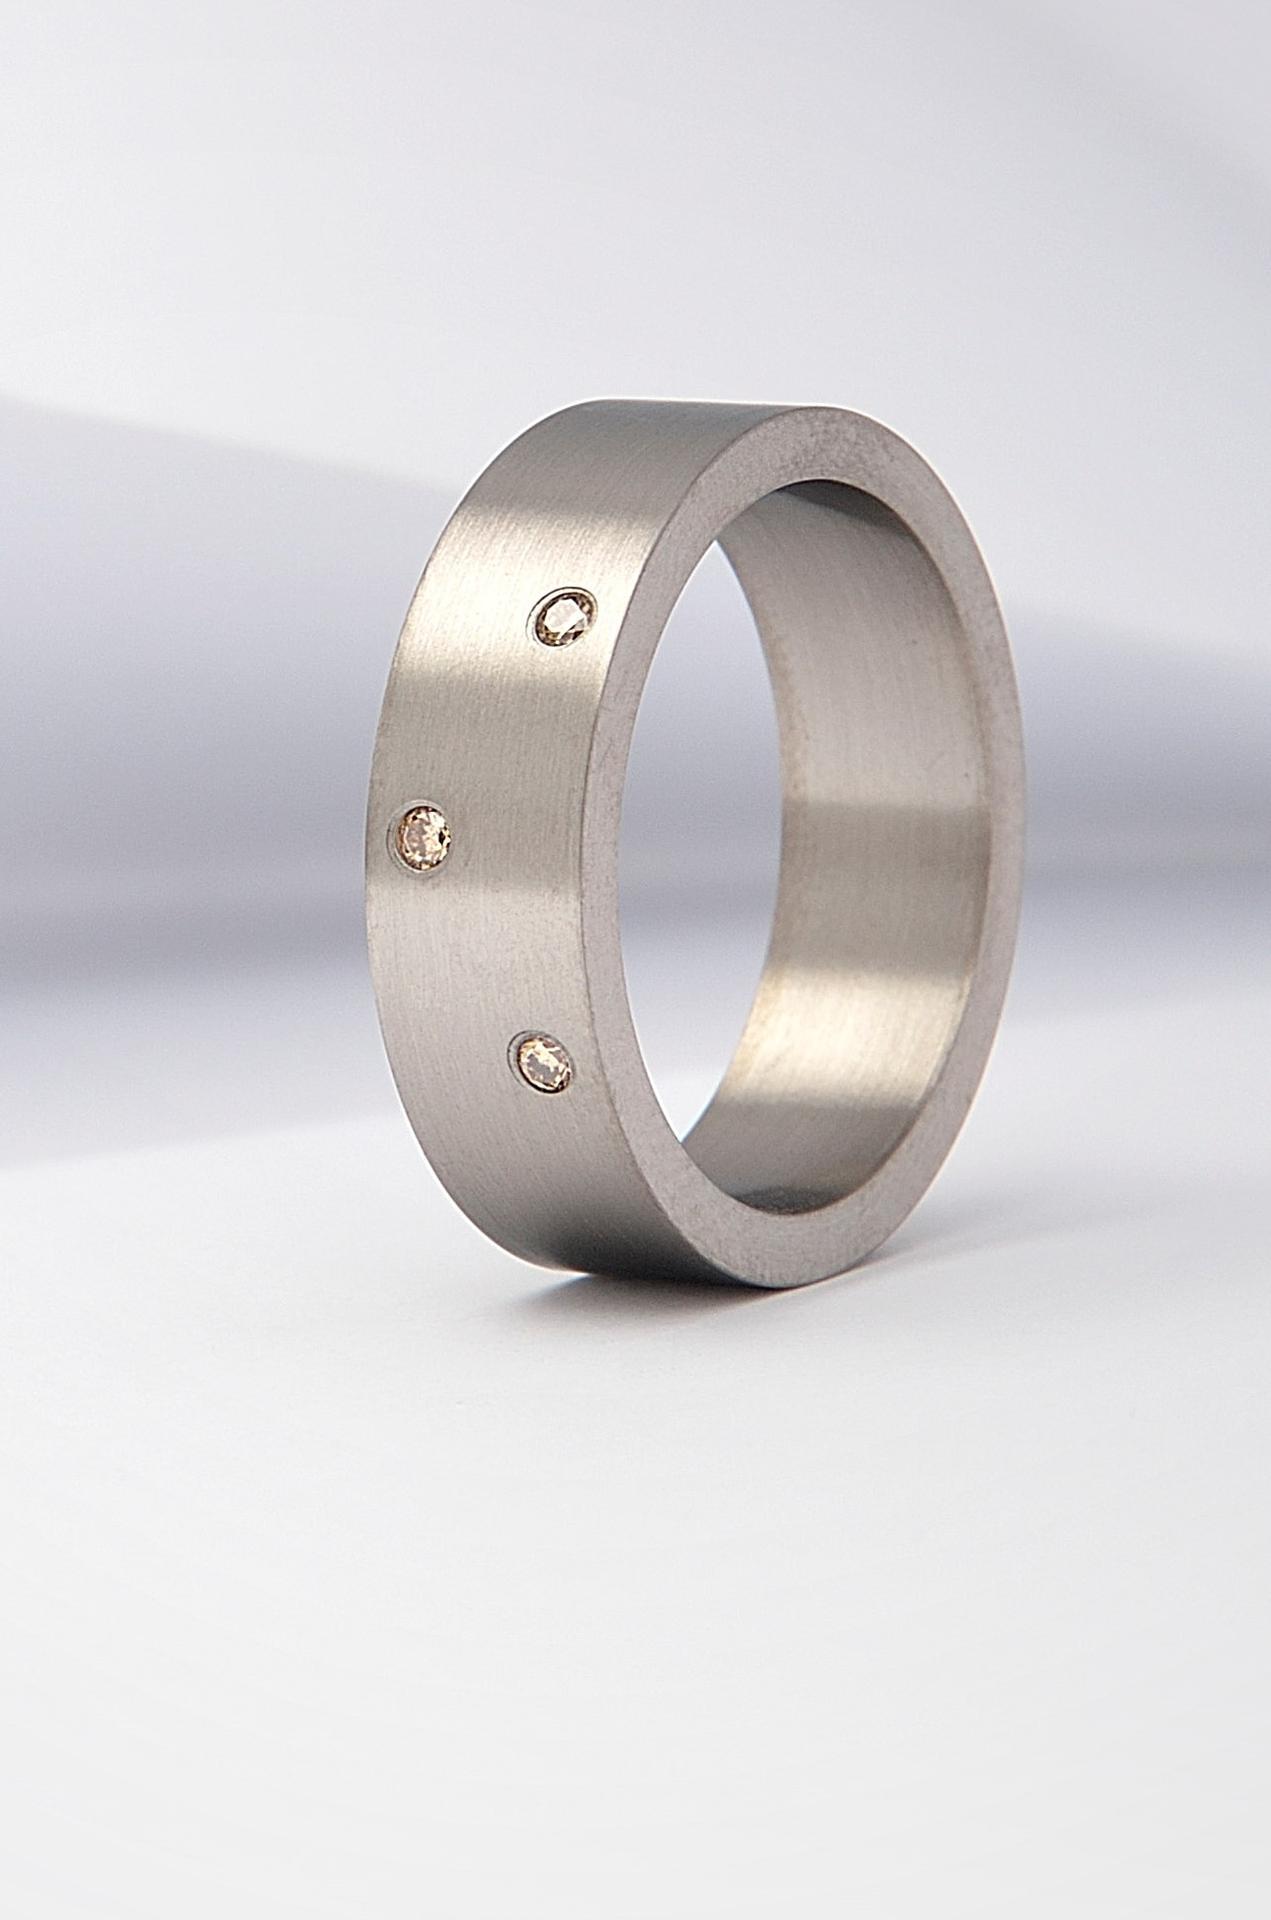 daloo - https://daloo.cz/zasnubni-prsteny/zasnubni-prsteny-modern.html